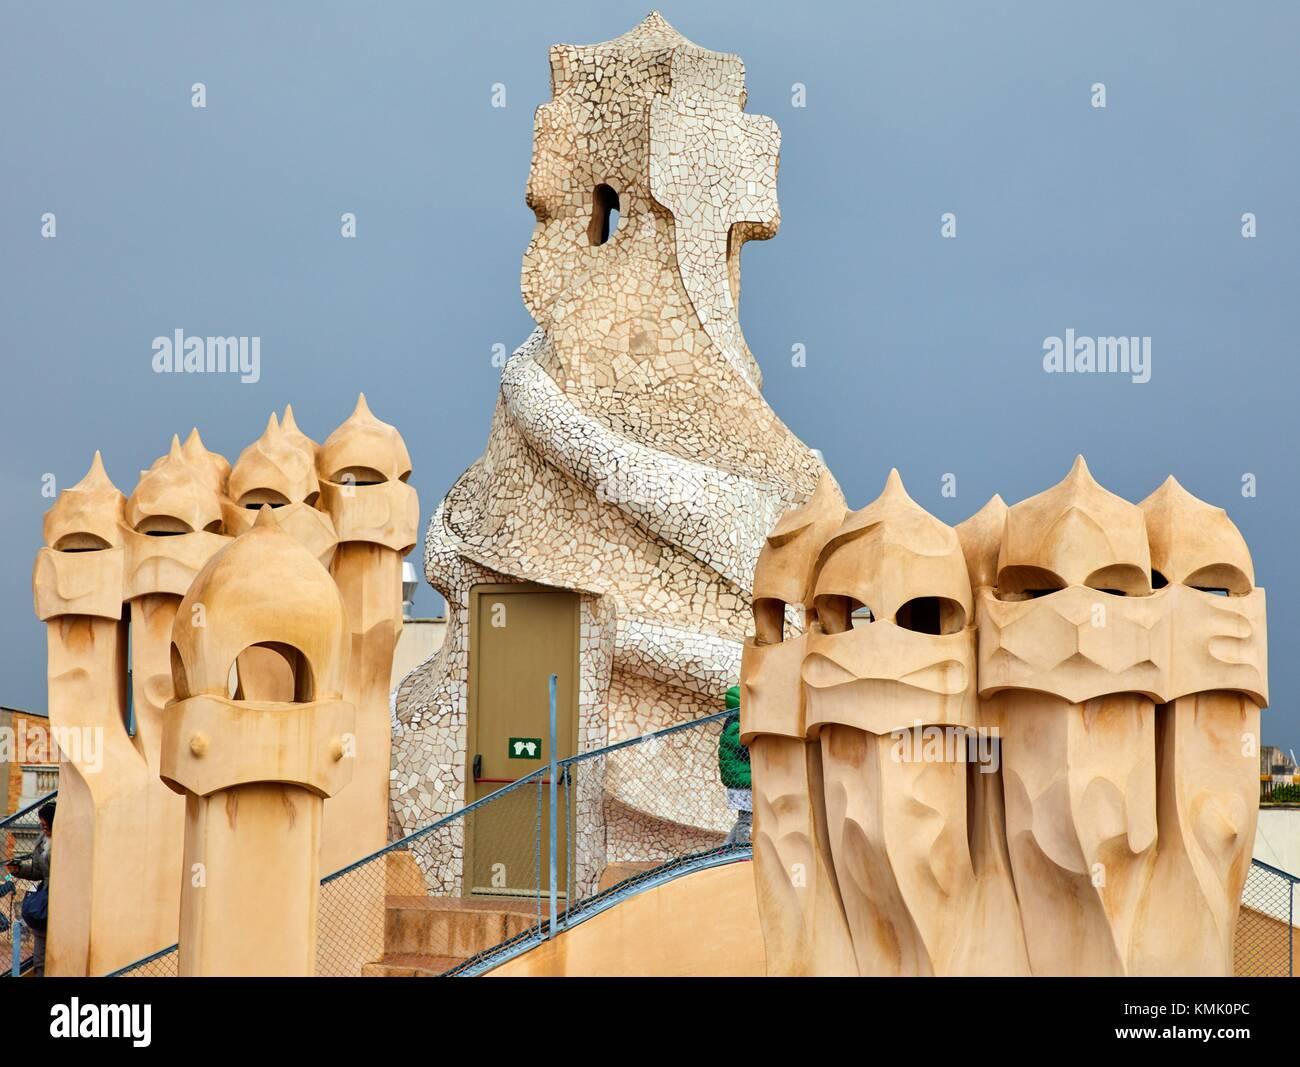 Chimneys on the rooftop of Casa Mila, La Pedrera building, Antoni Gaudi, Barcelona, Catalonia, Spain - Stock Image